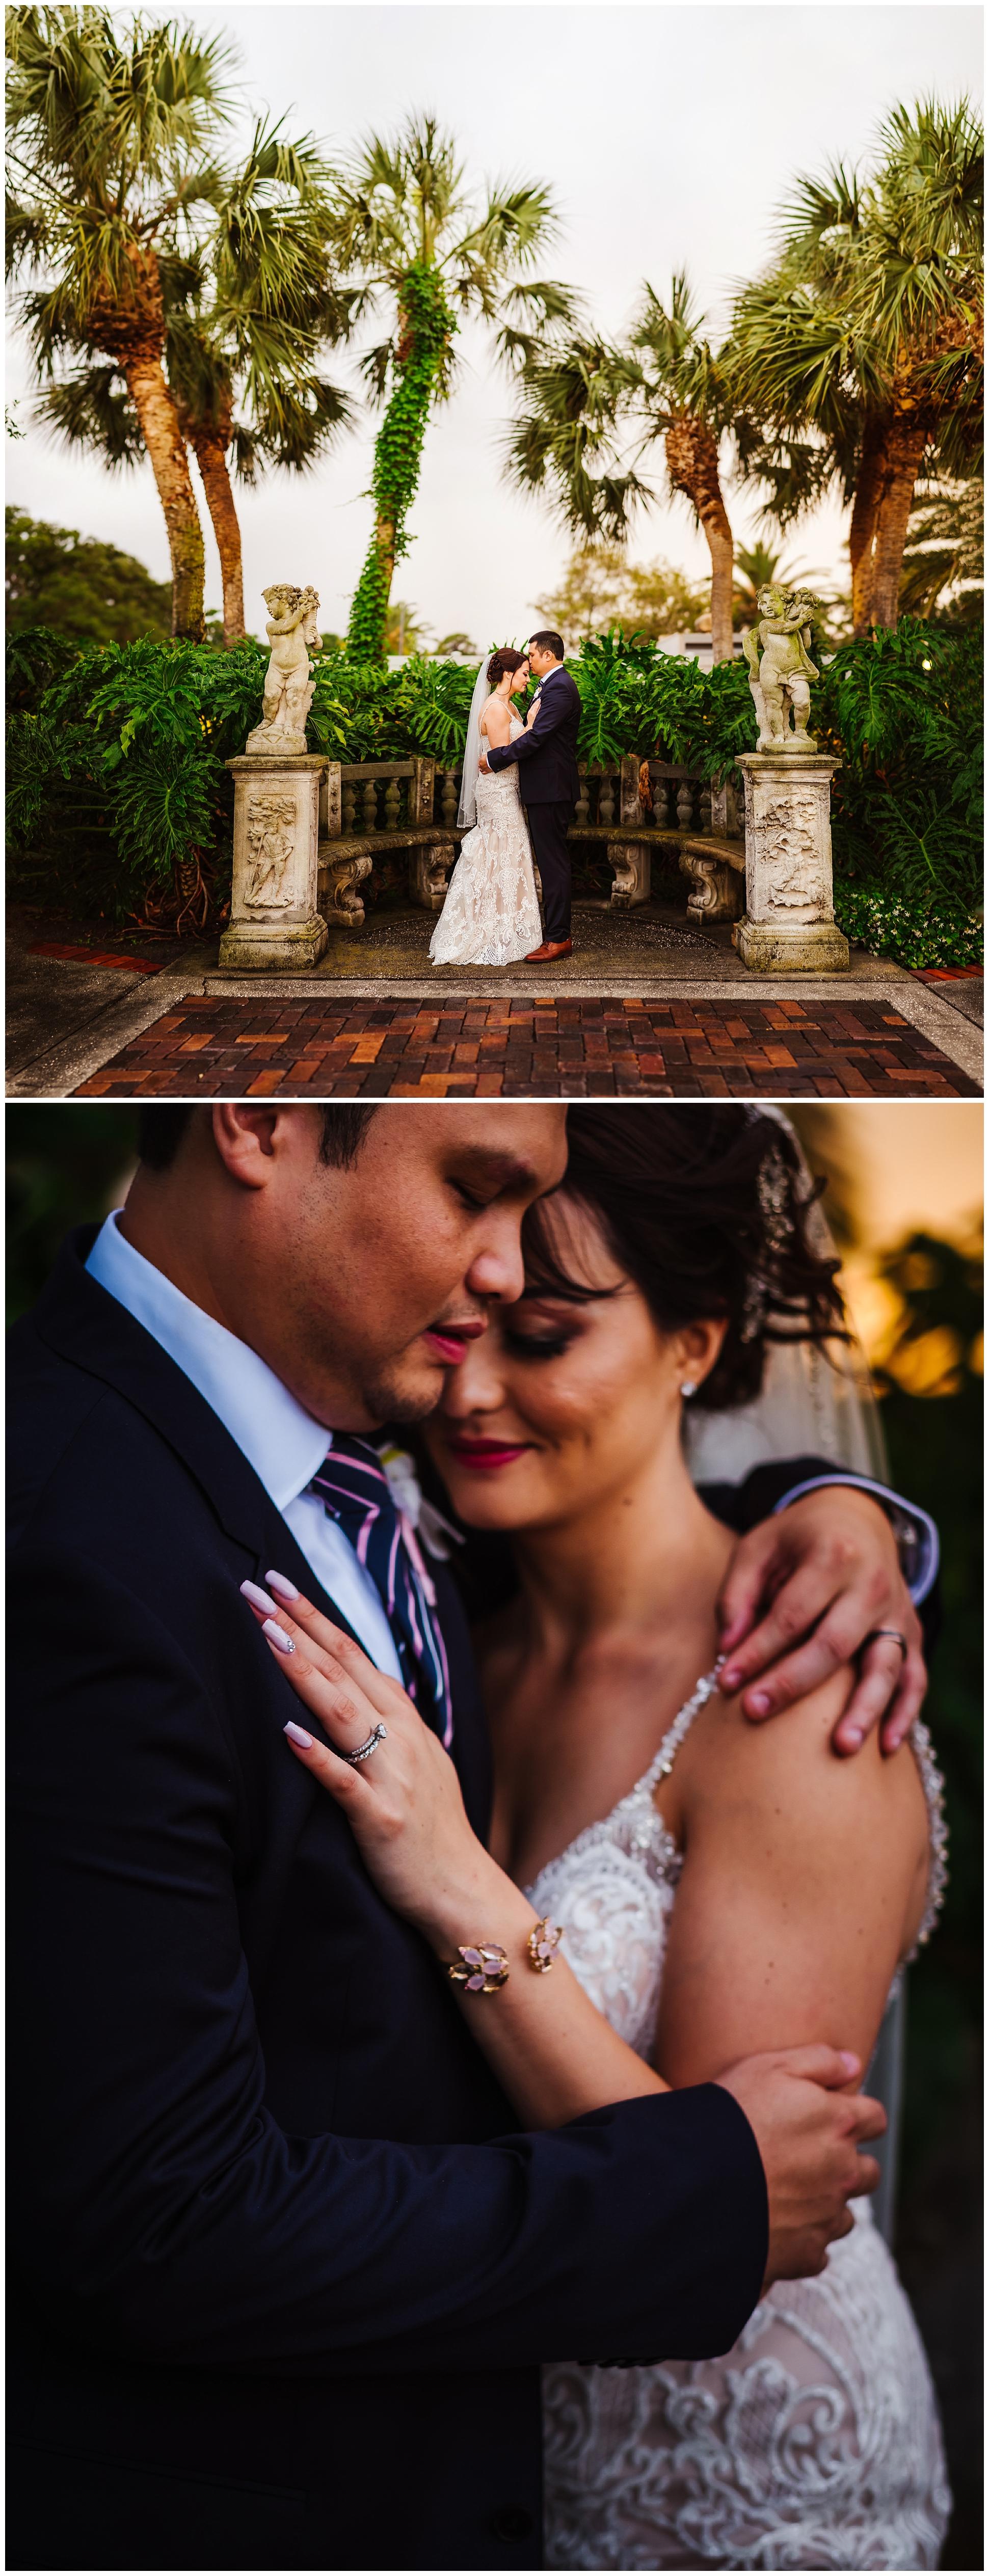 vinoy-sunset-ballroom-rainy-day-wedding-photography-orchids-trinidad-flawless-fetes-ashlee-hamon_0153.jpg